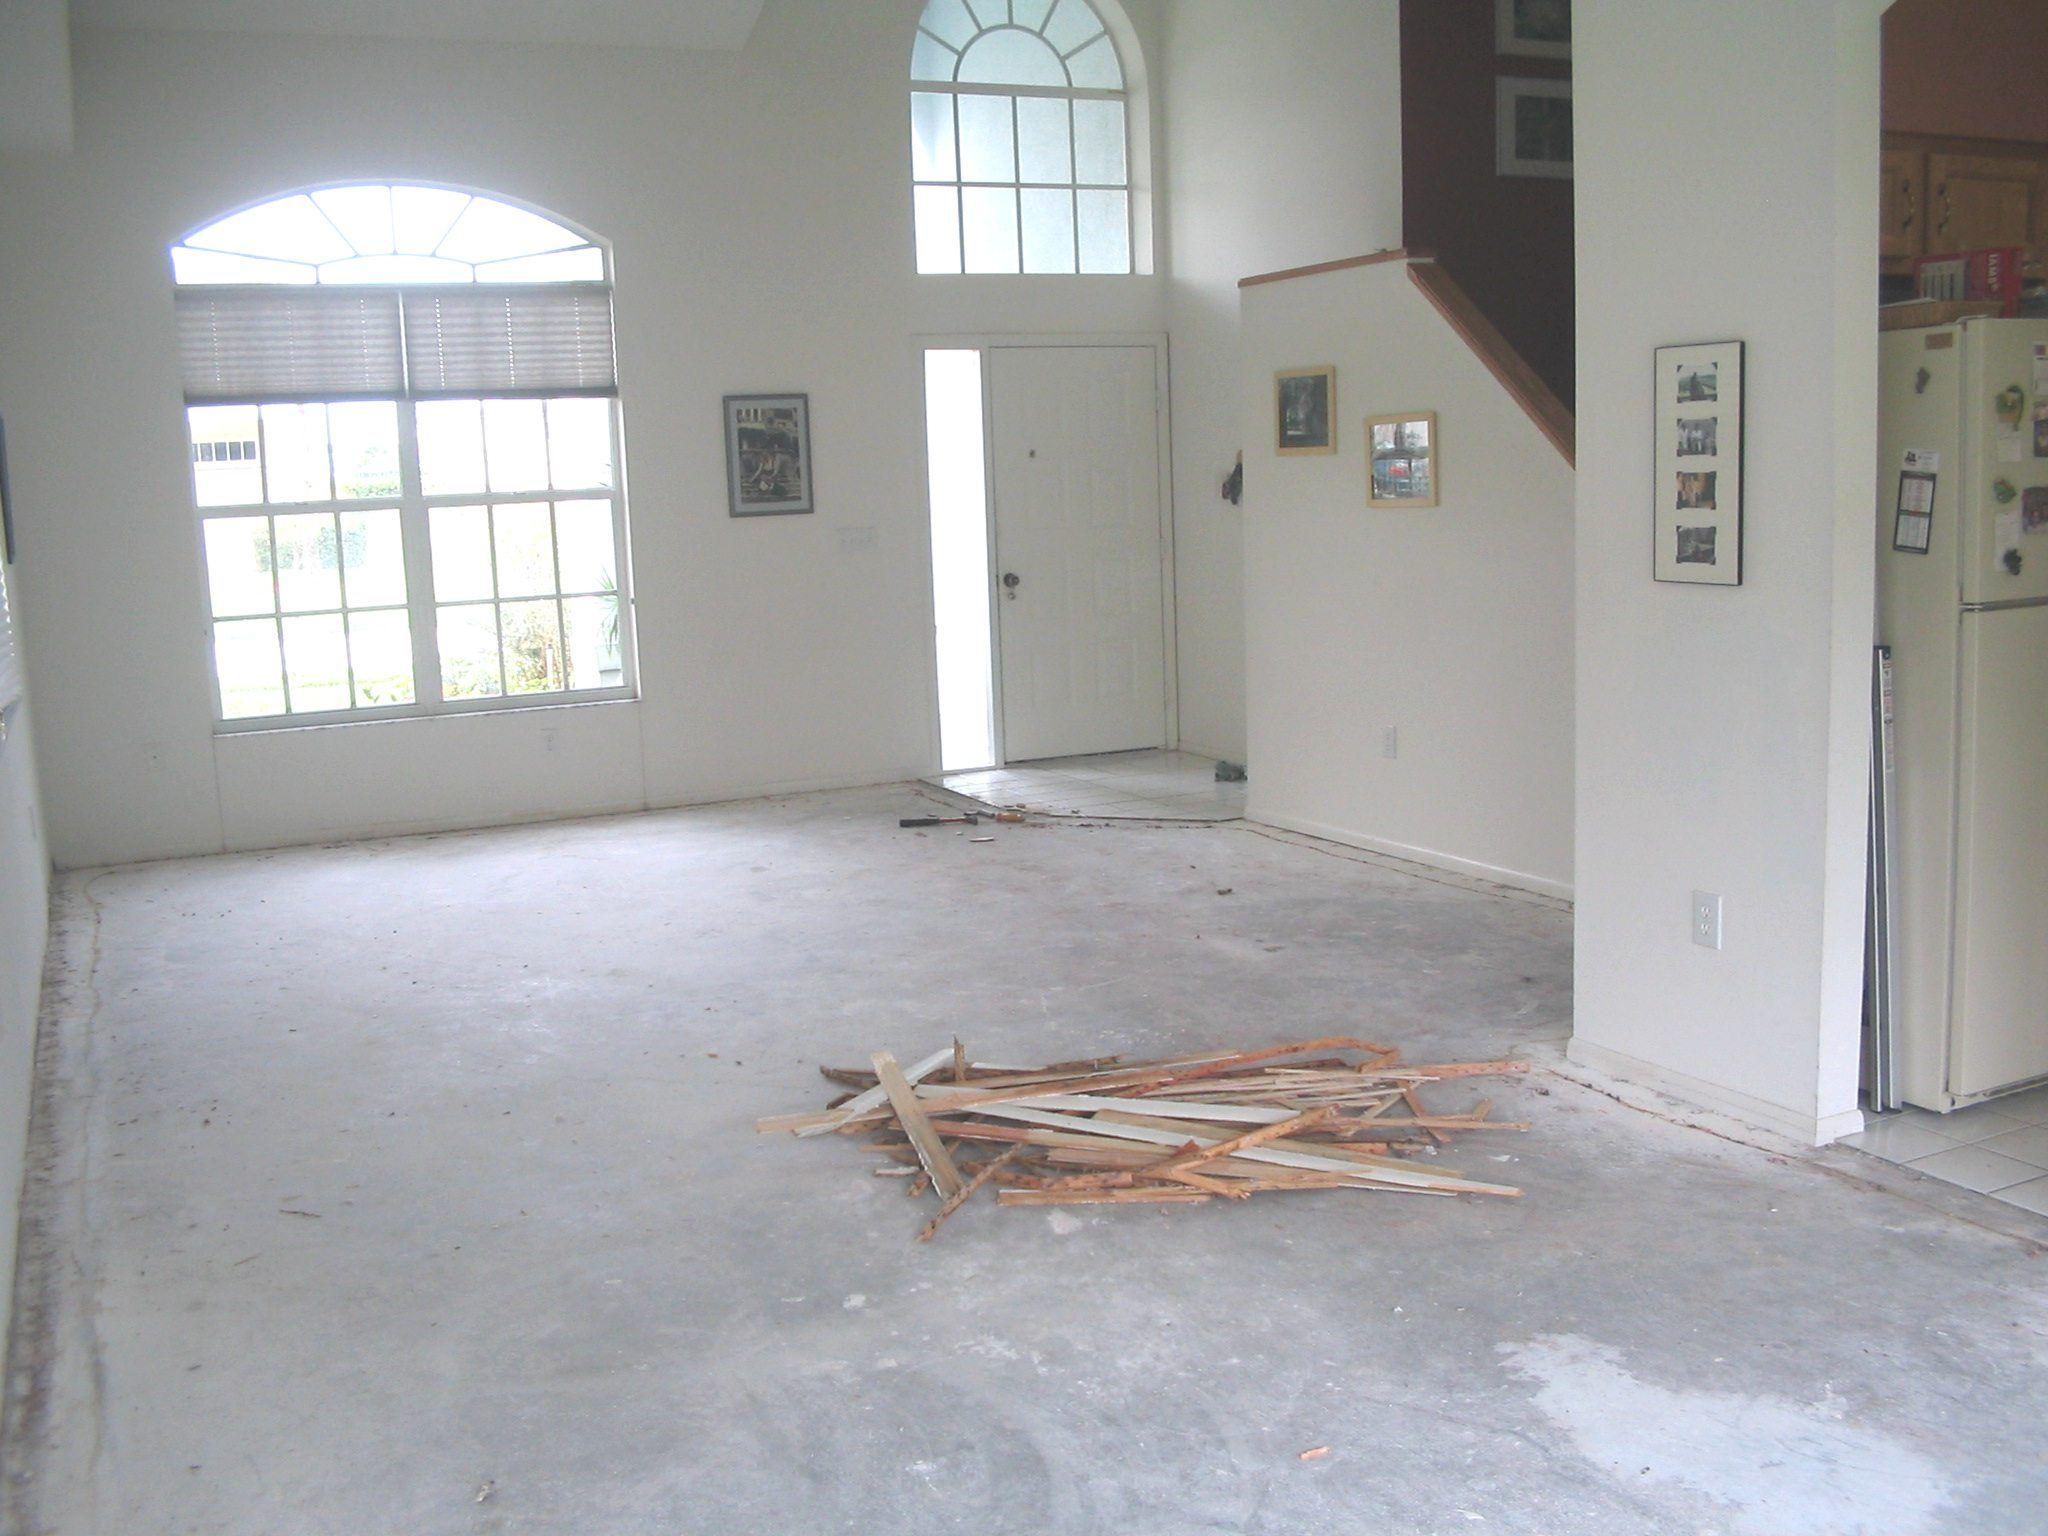 Simple Preparing Painted Concrete Floor For Tiling Remodel Ideas